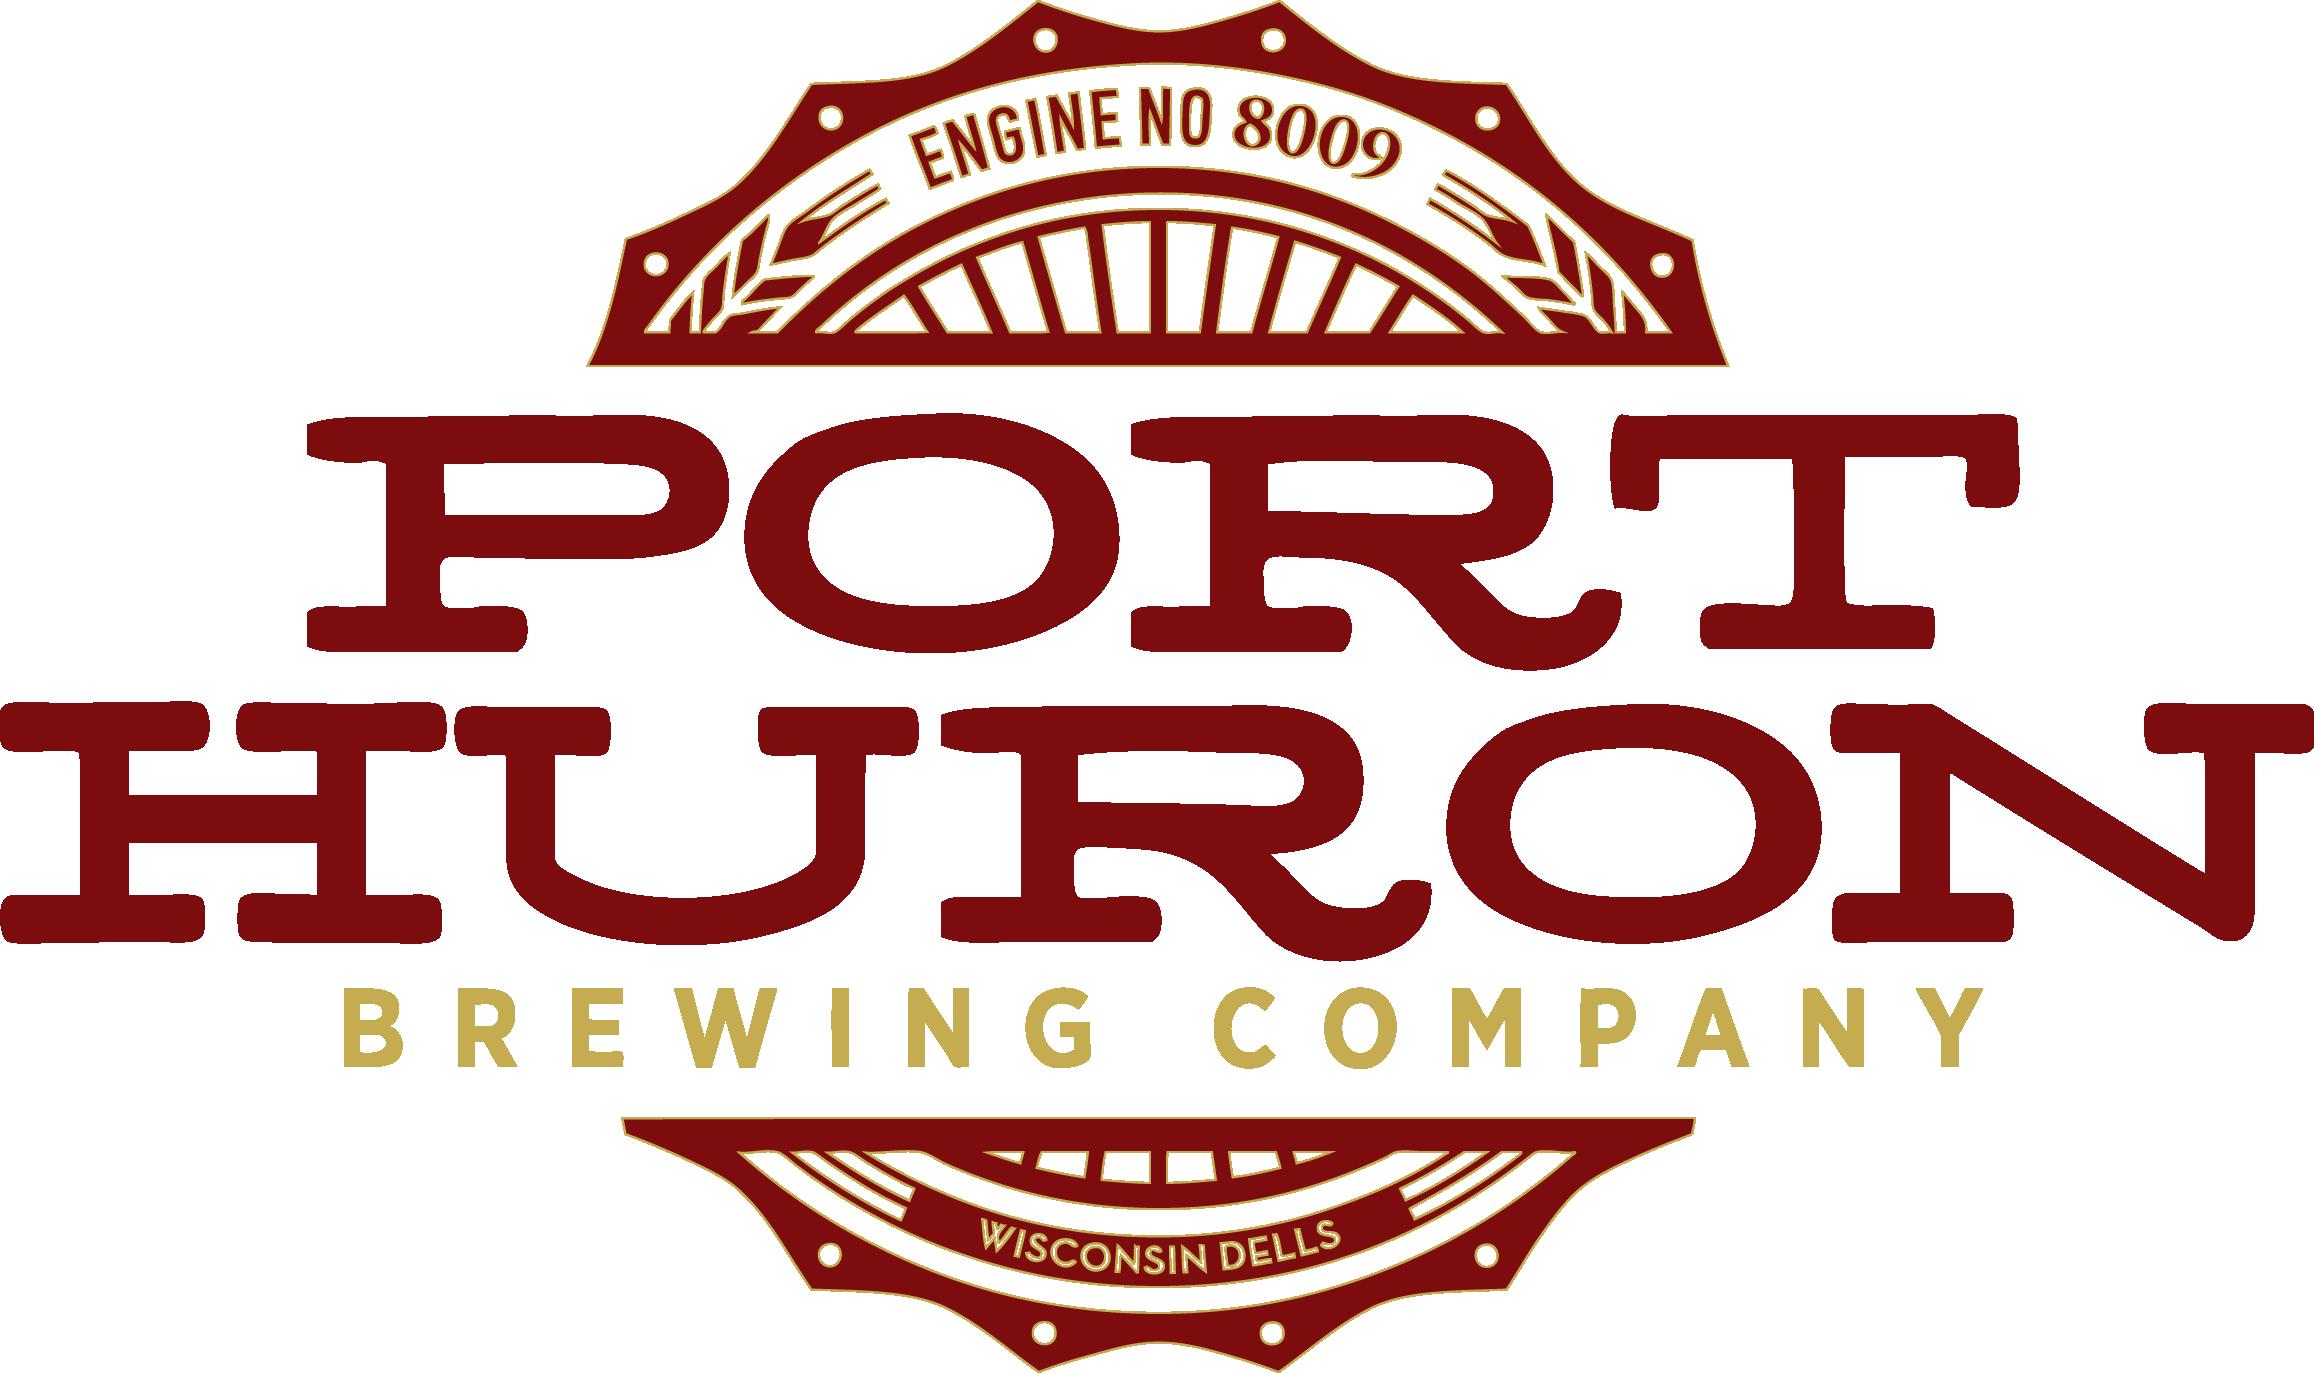 Port_Huron_logo.ai-3.png